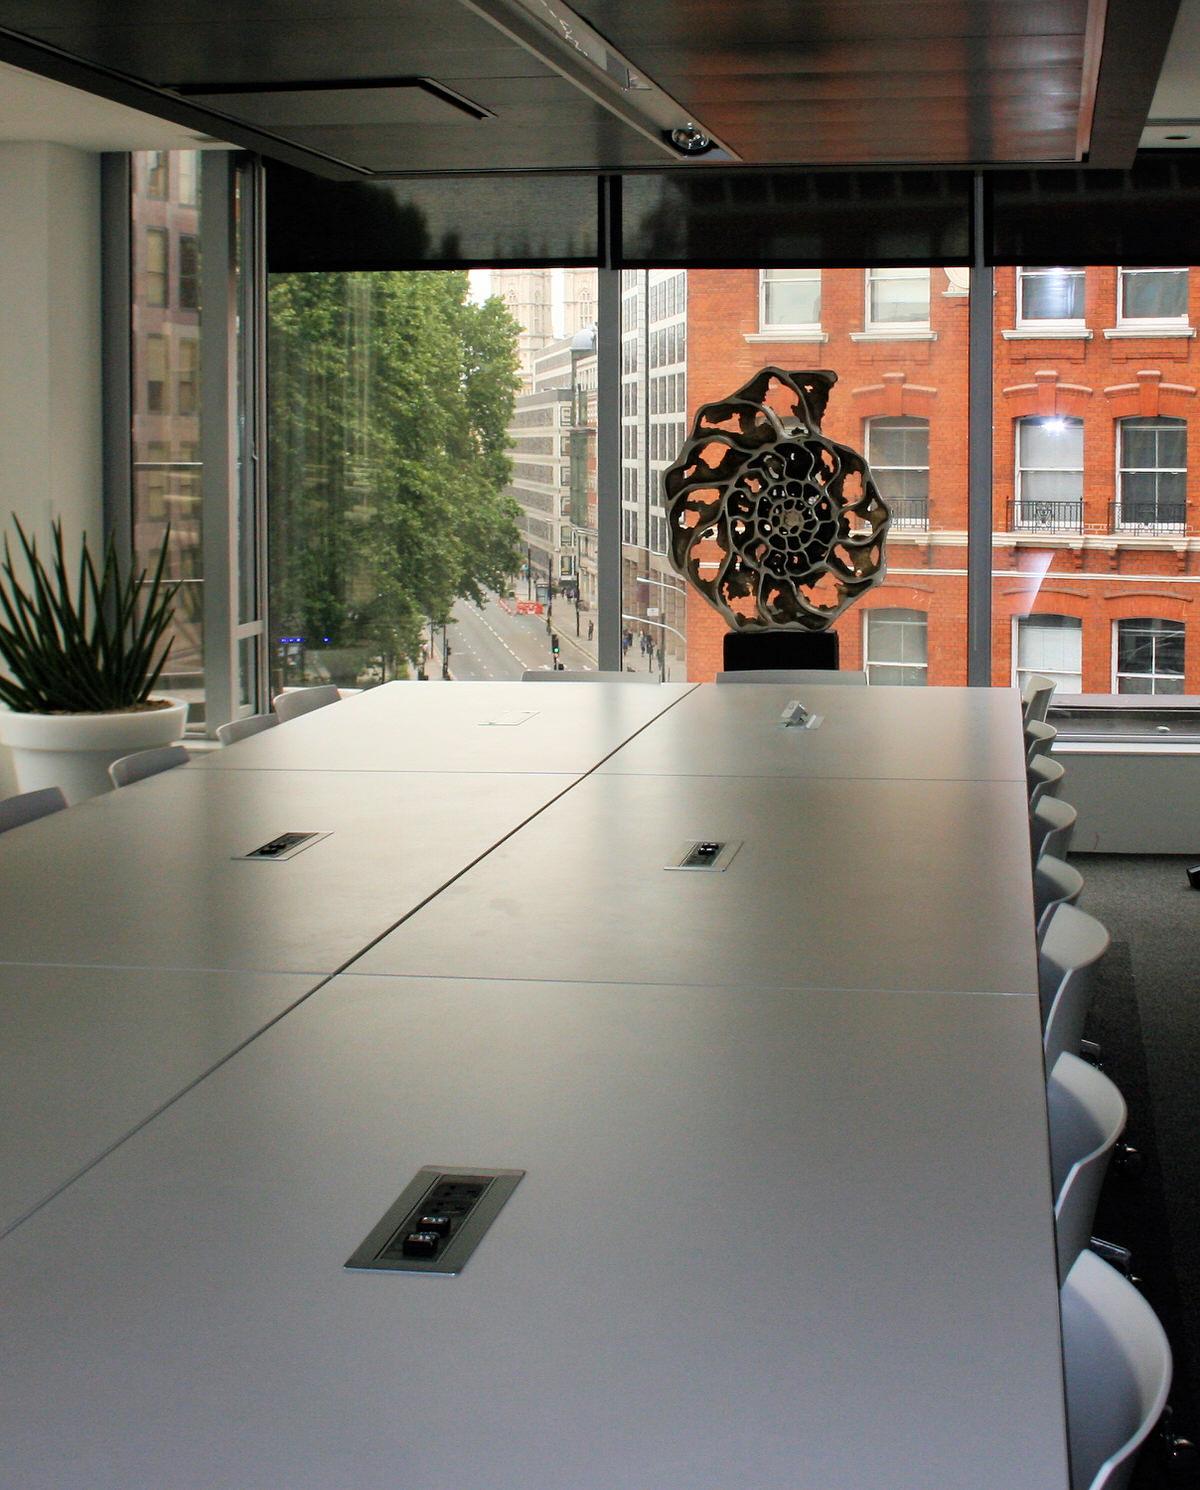 Ammonite slice inside sculpture bronze sculpture specifier sculpture corporate sculpture for contemporary offices